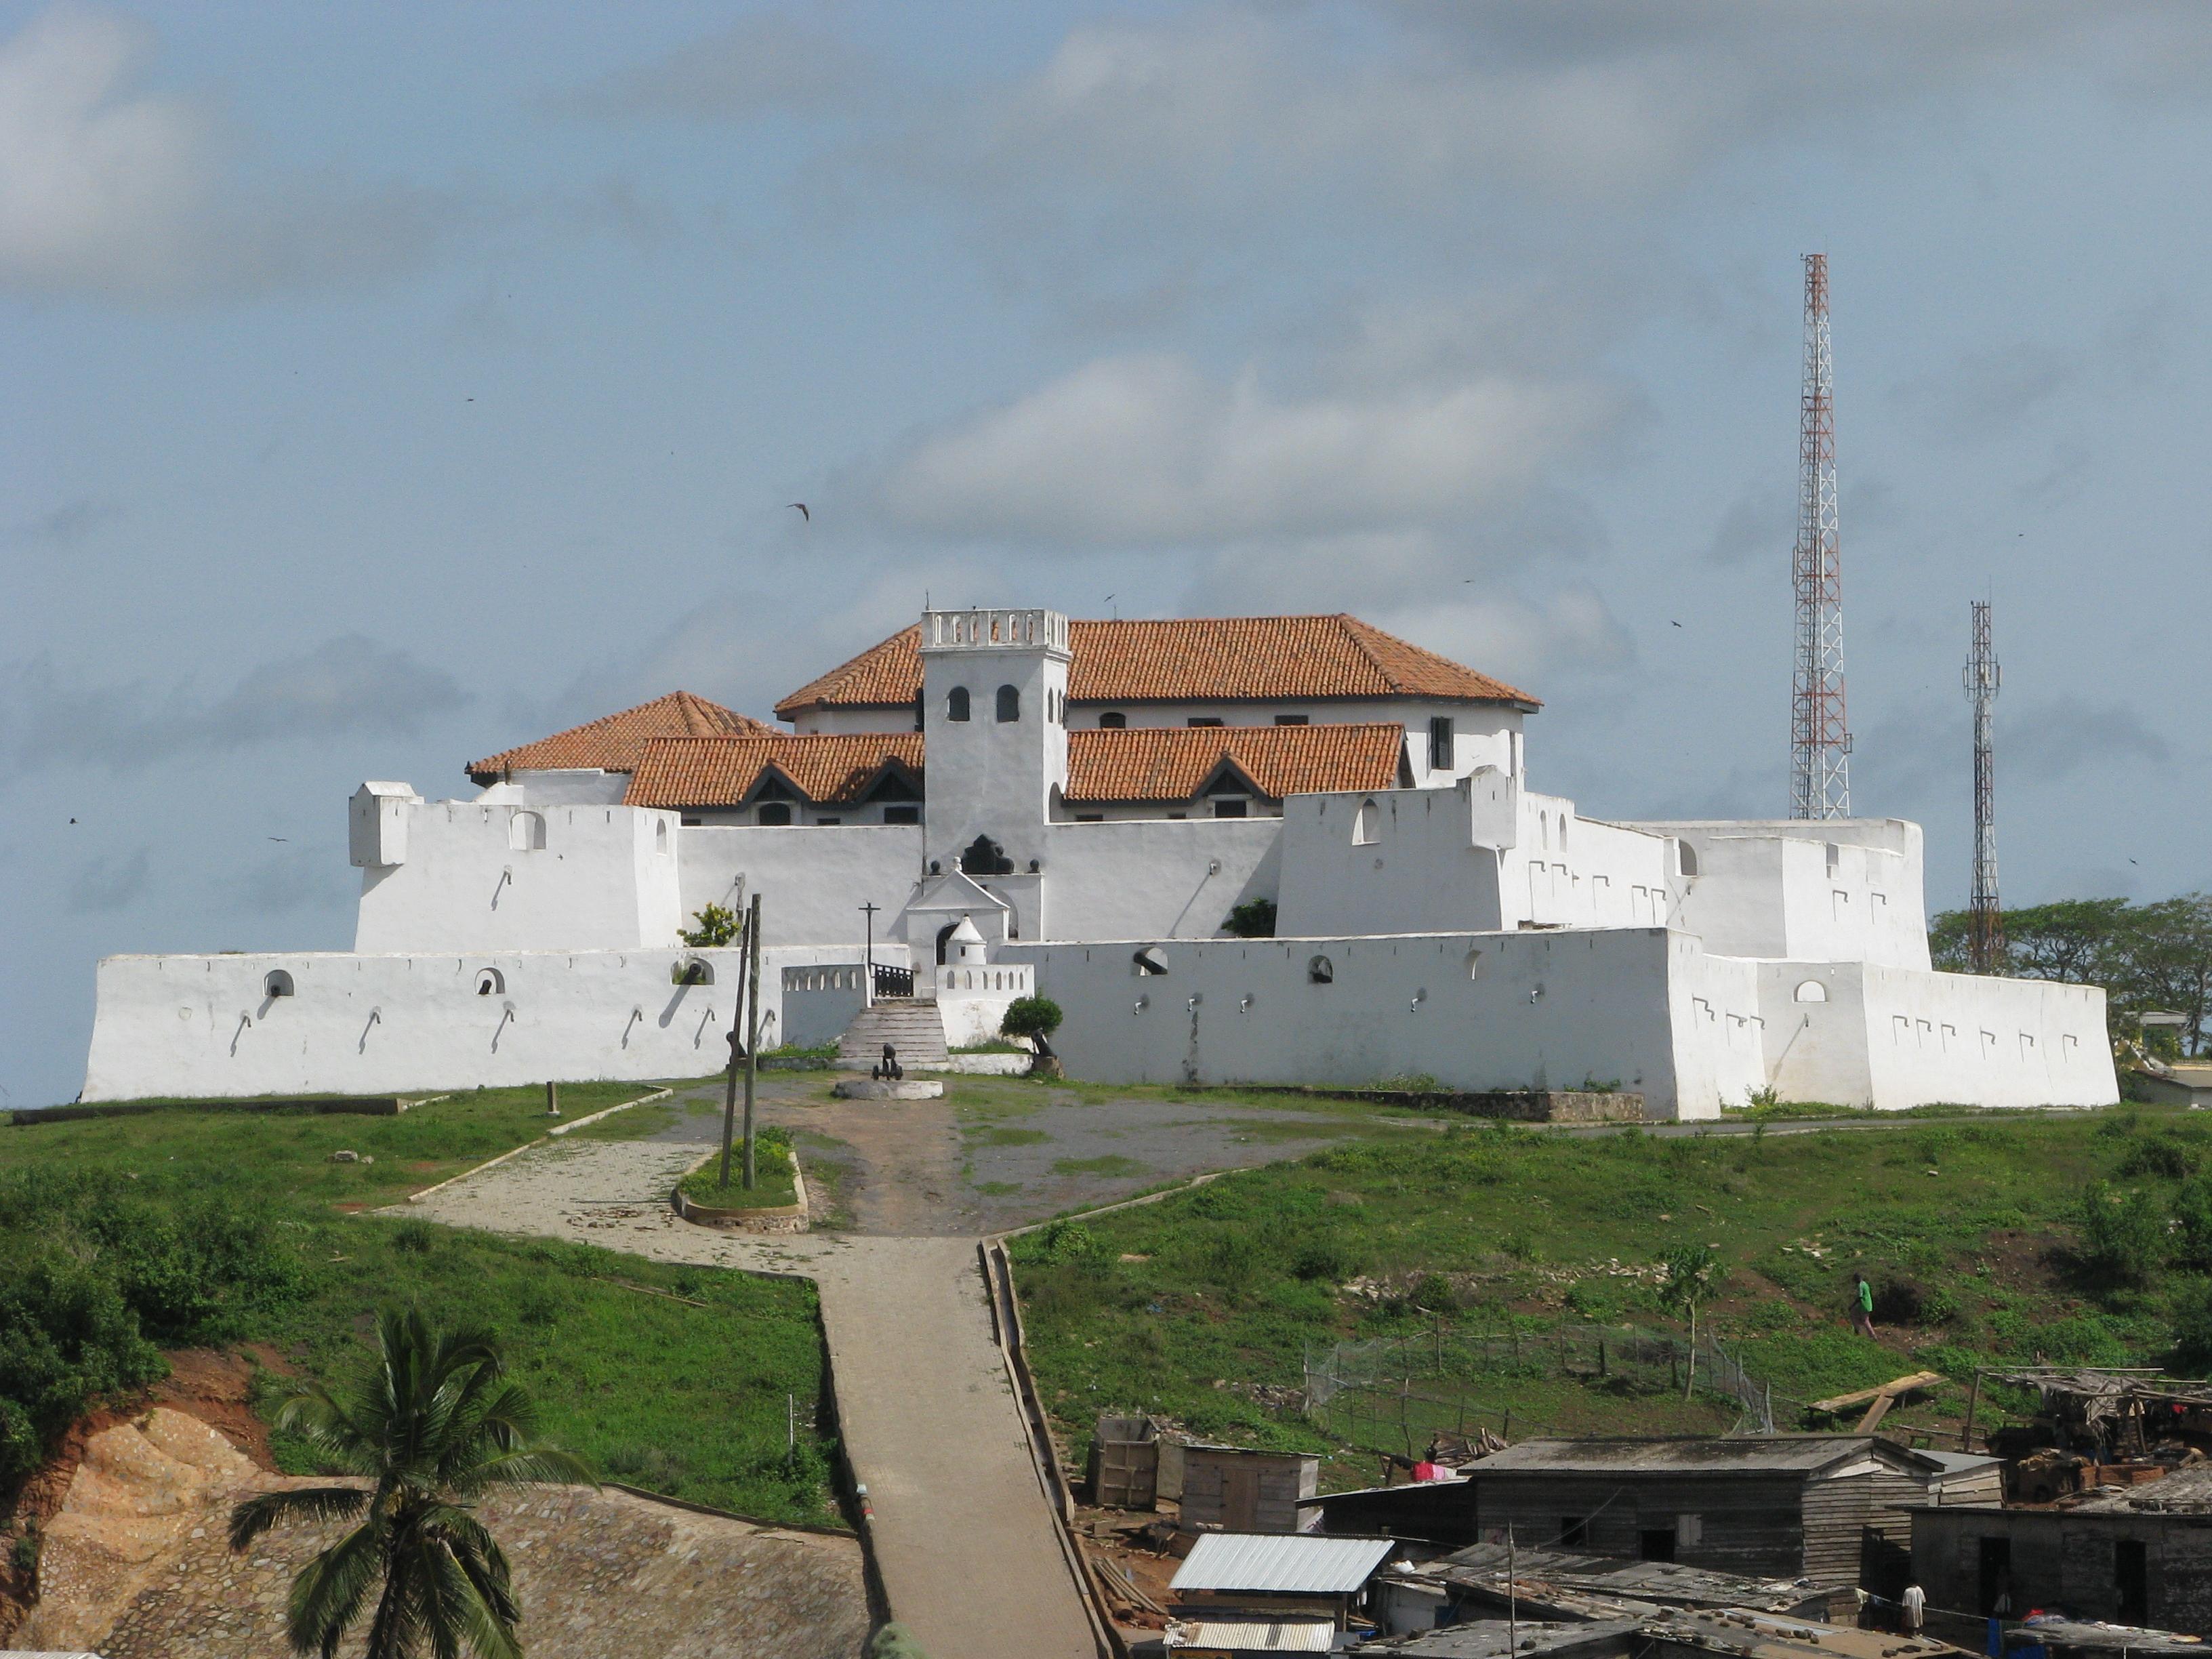 Fort st jago elmina ghana George Emil Eminsang Biography & History